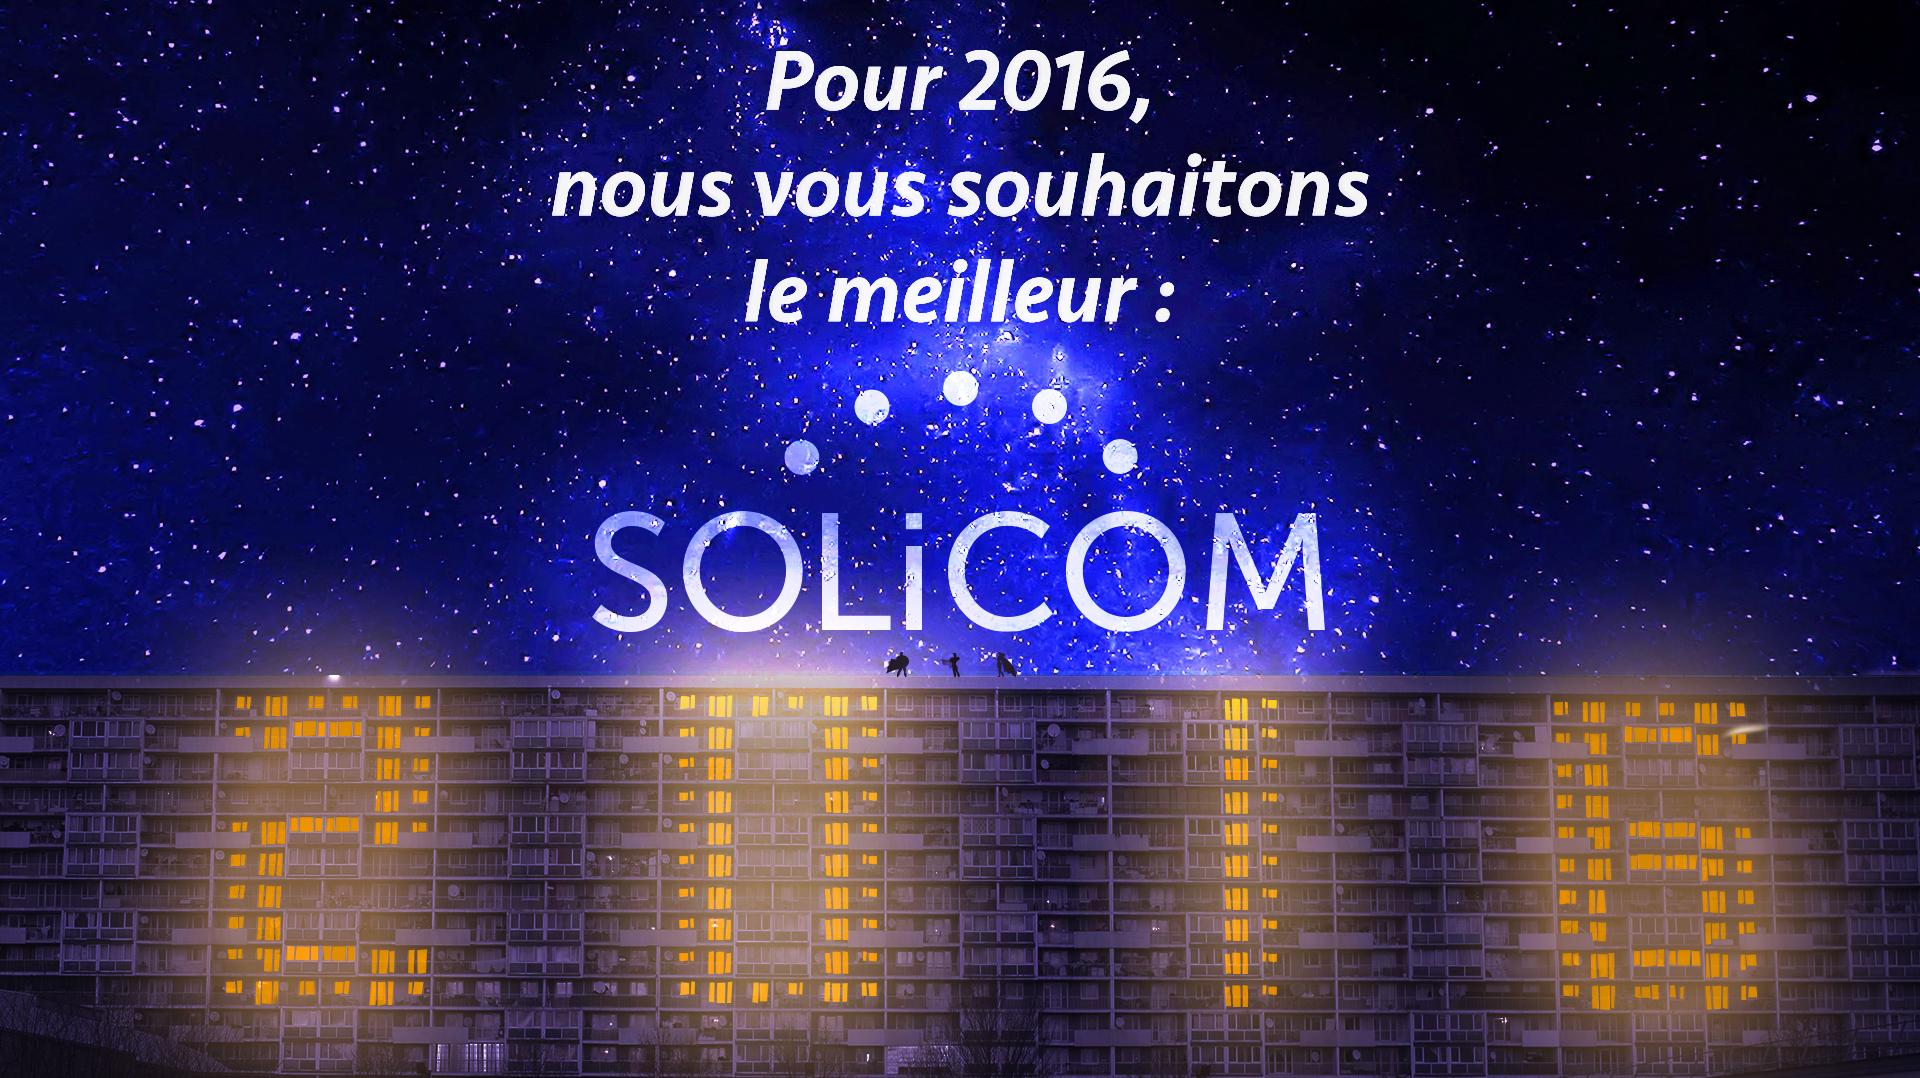 Solicom 2016 HD